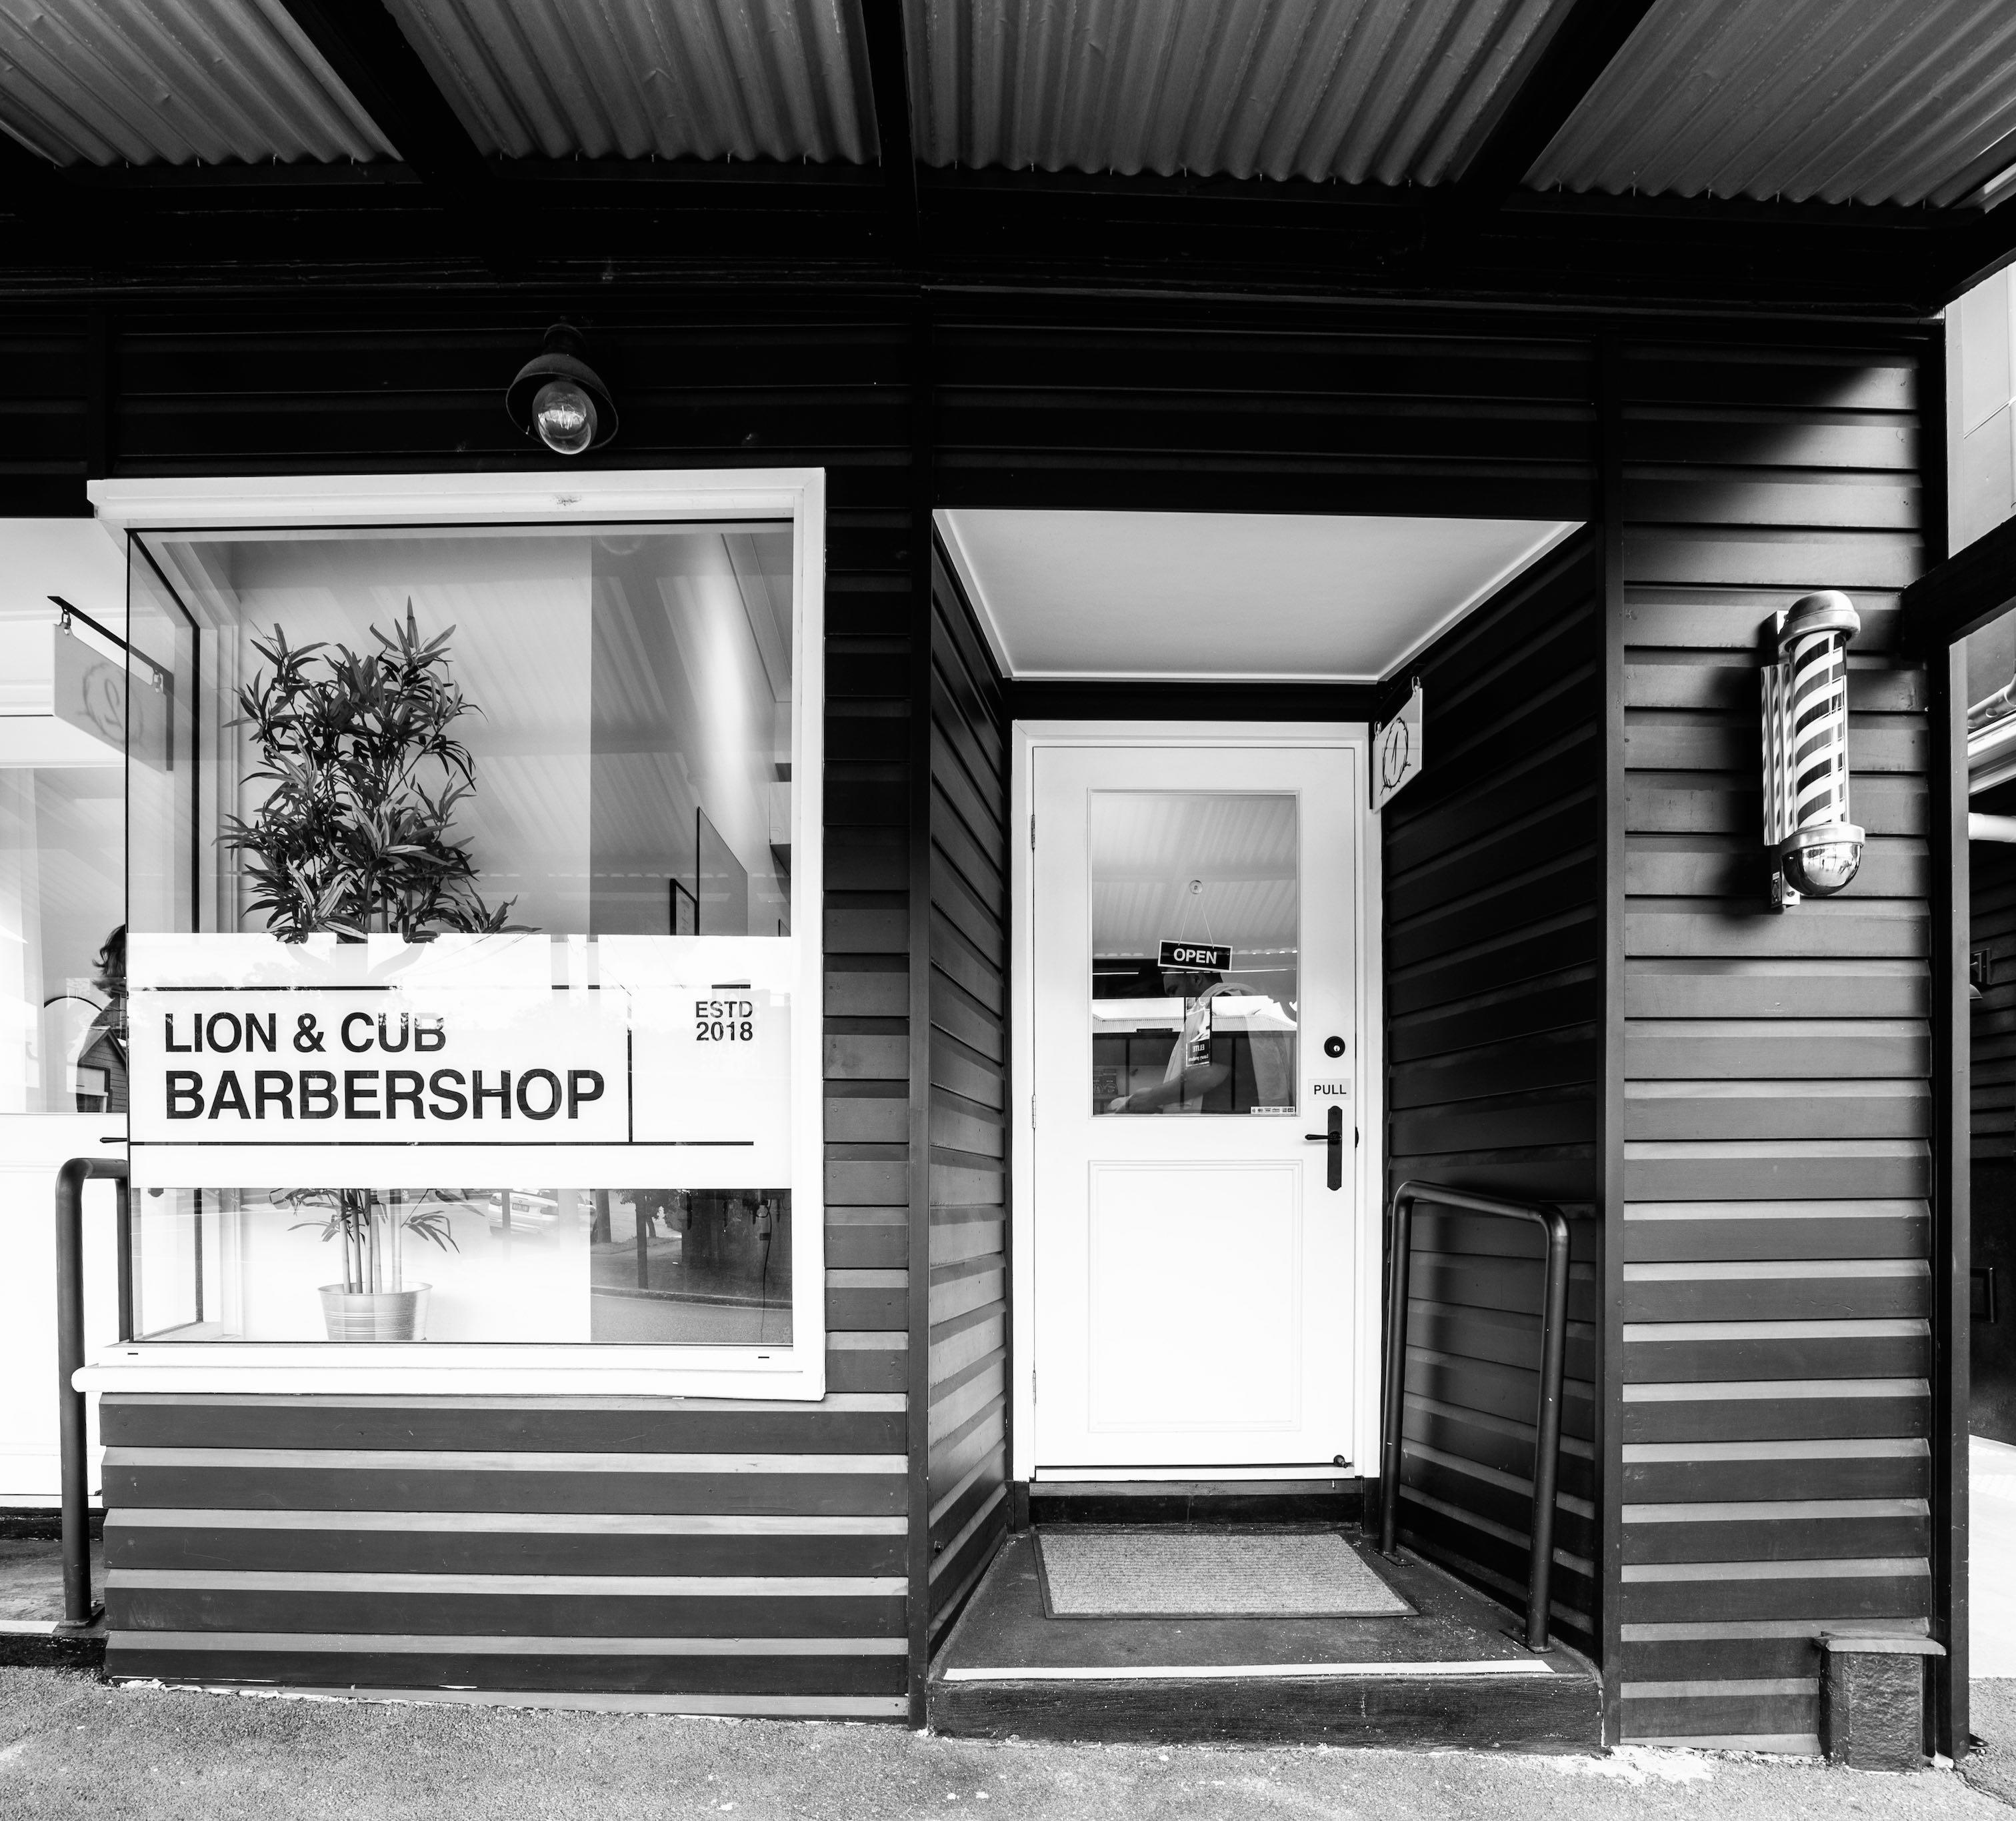 Lion & Cub Barbershop